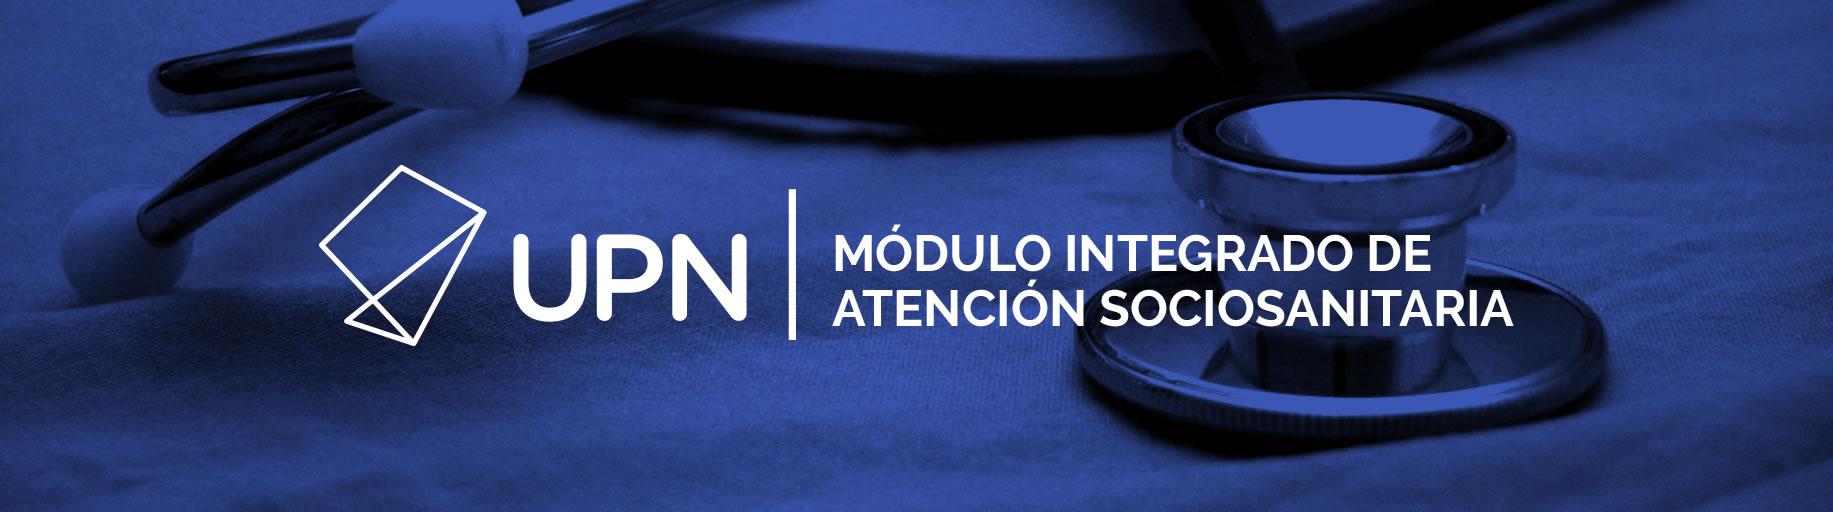 MÓDULO INTEGRADO DE ATENCIÓN SOCIOSANITARIA